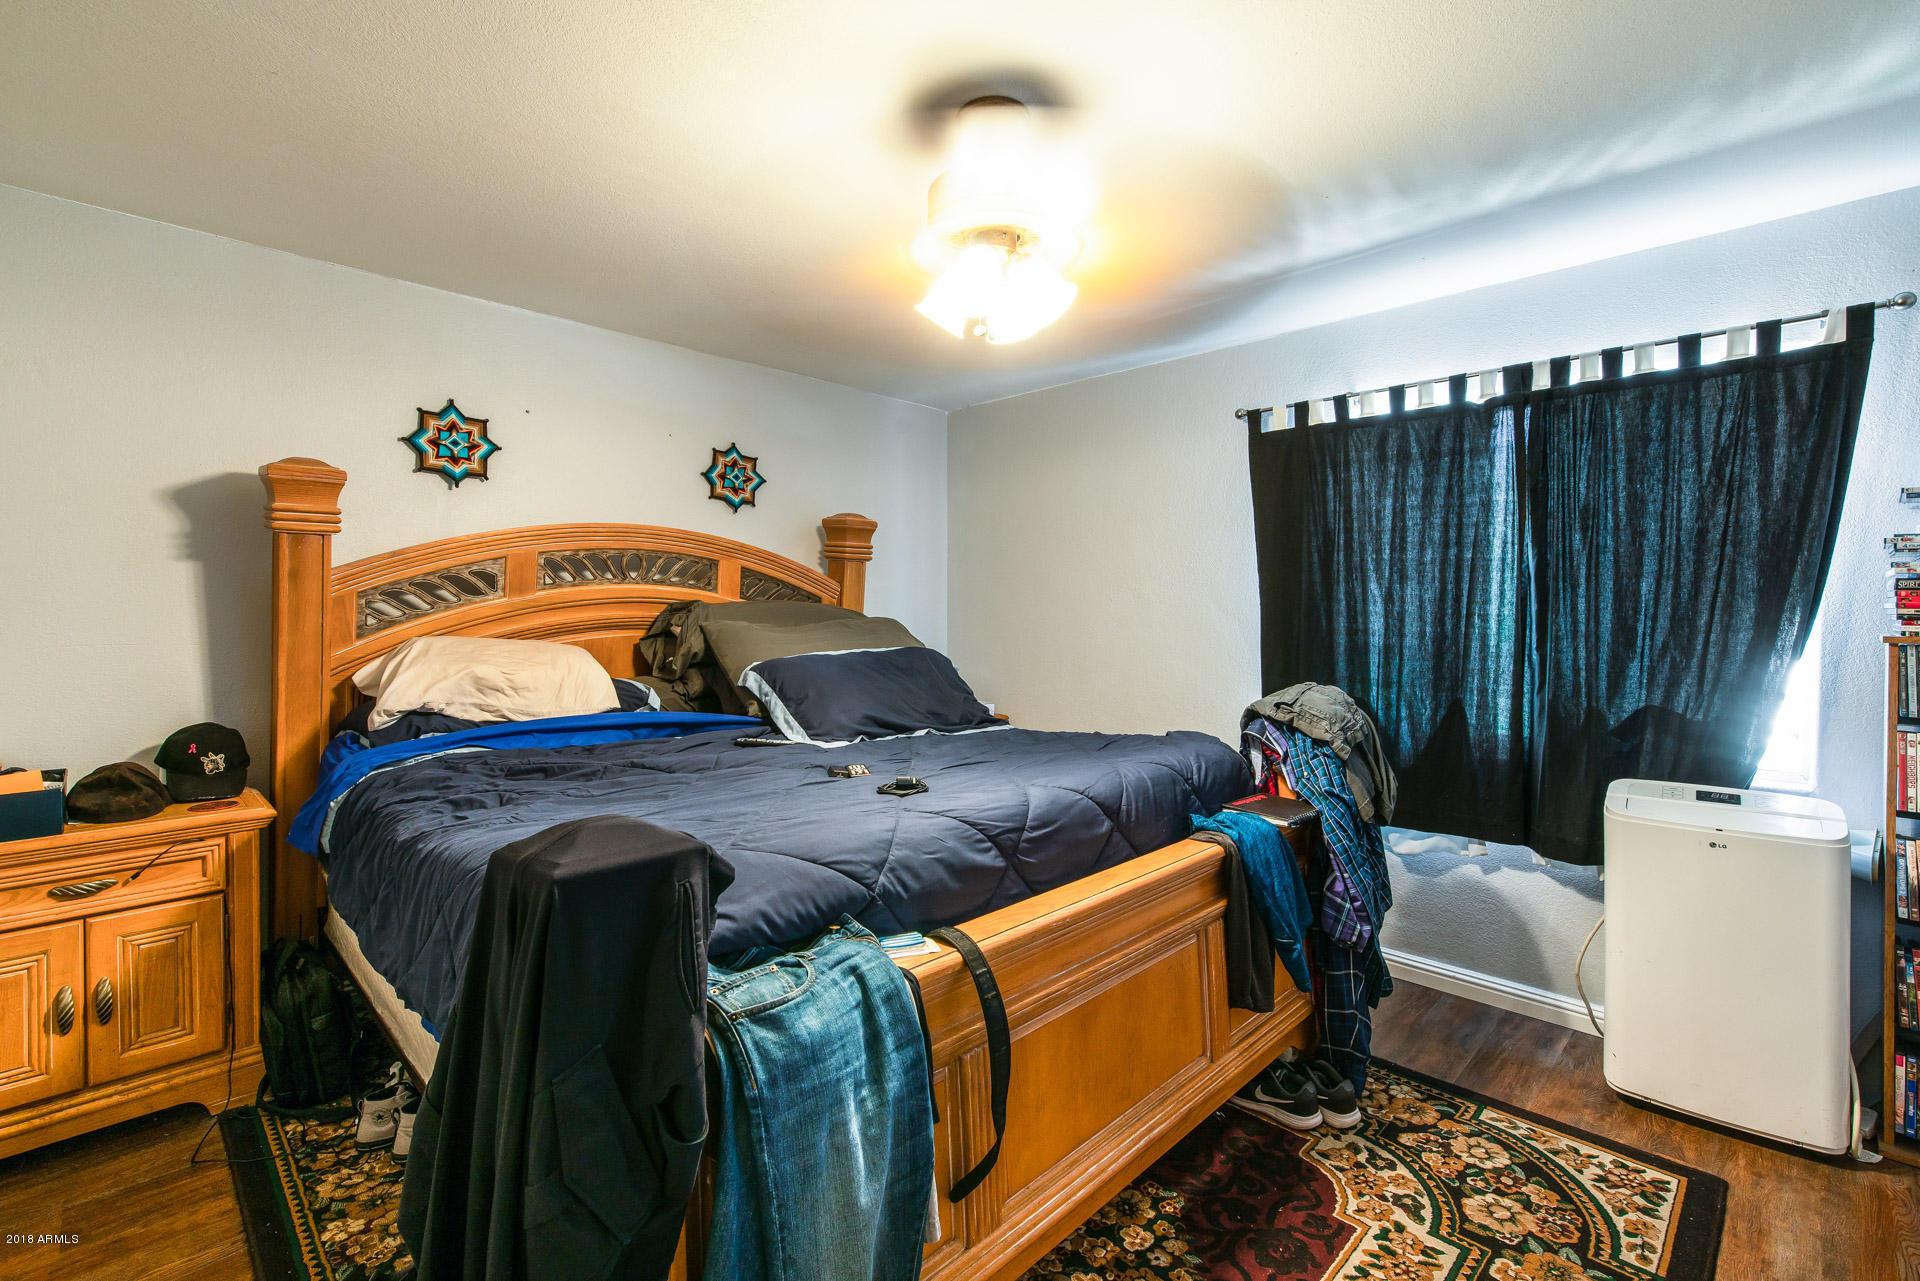 MLS 5848893 3314 N 68TH Street Unit 240W, Scottsdale, AZ 85251 Scottsdale AZ Short Sale